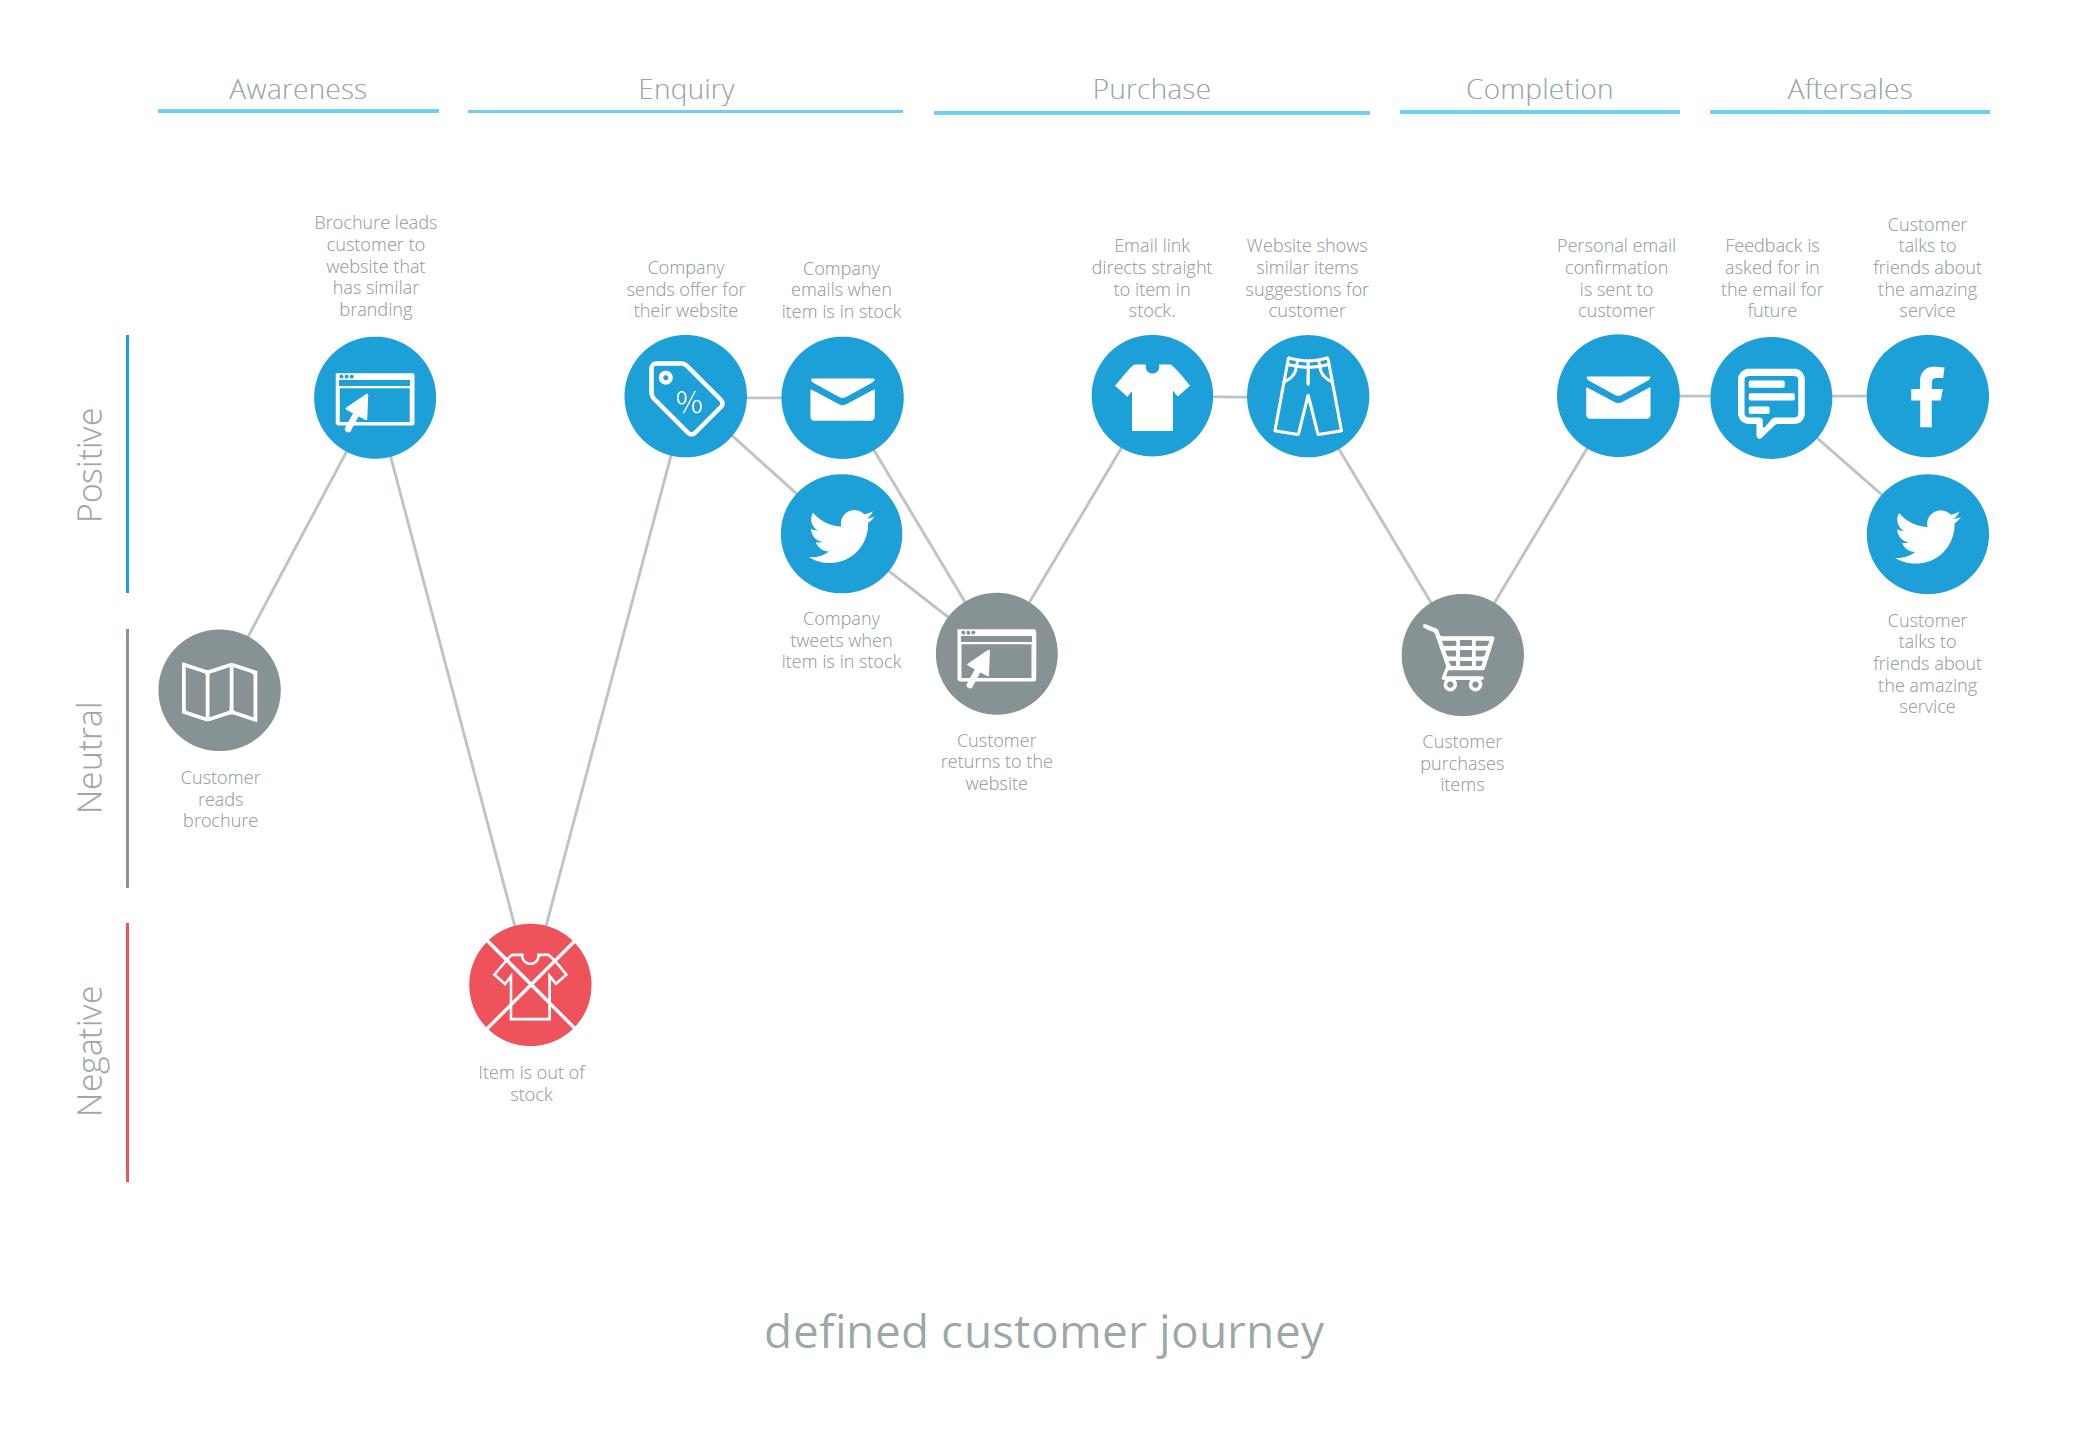 Customer Journey Map for e-Commerce   Customer journey mapping ...